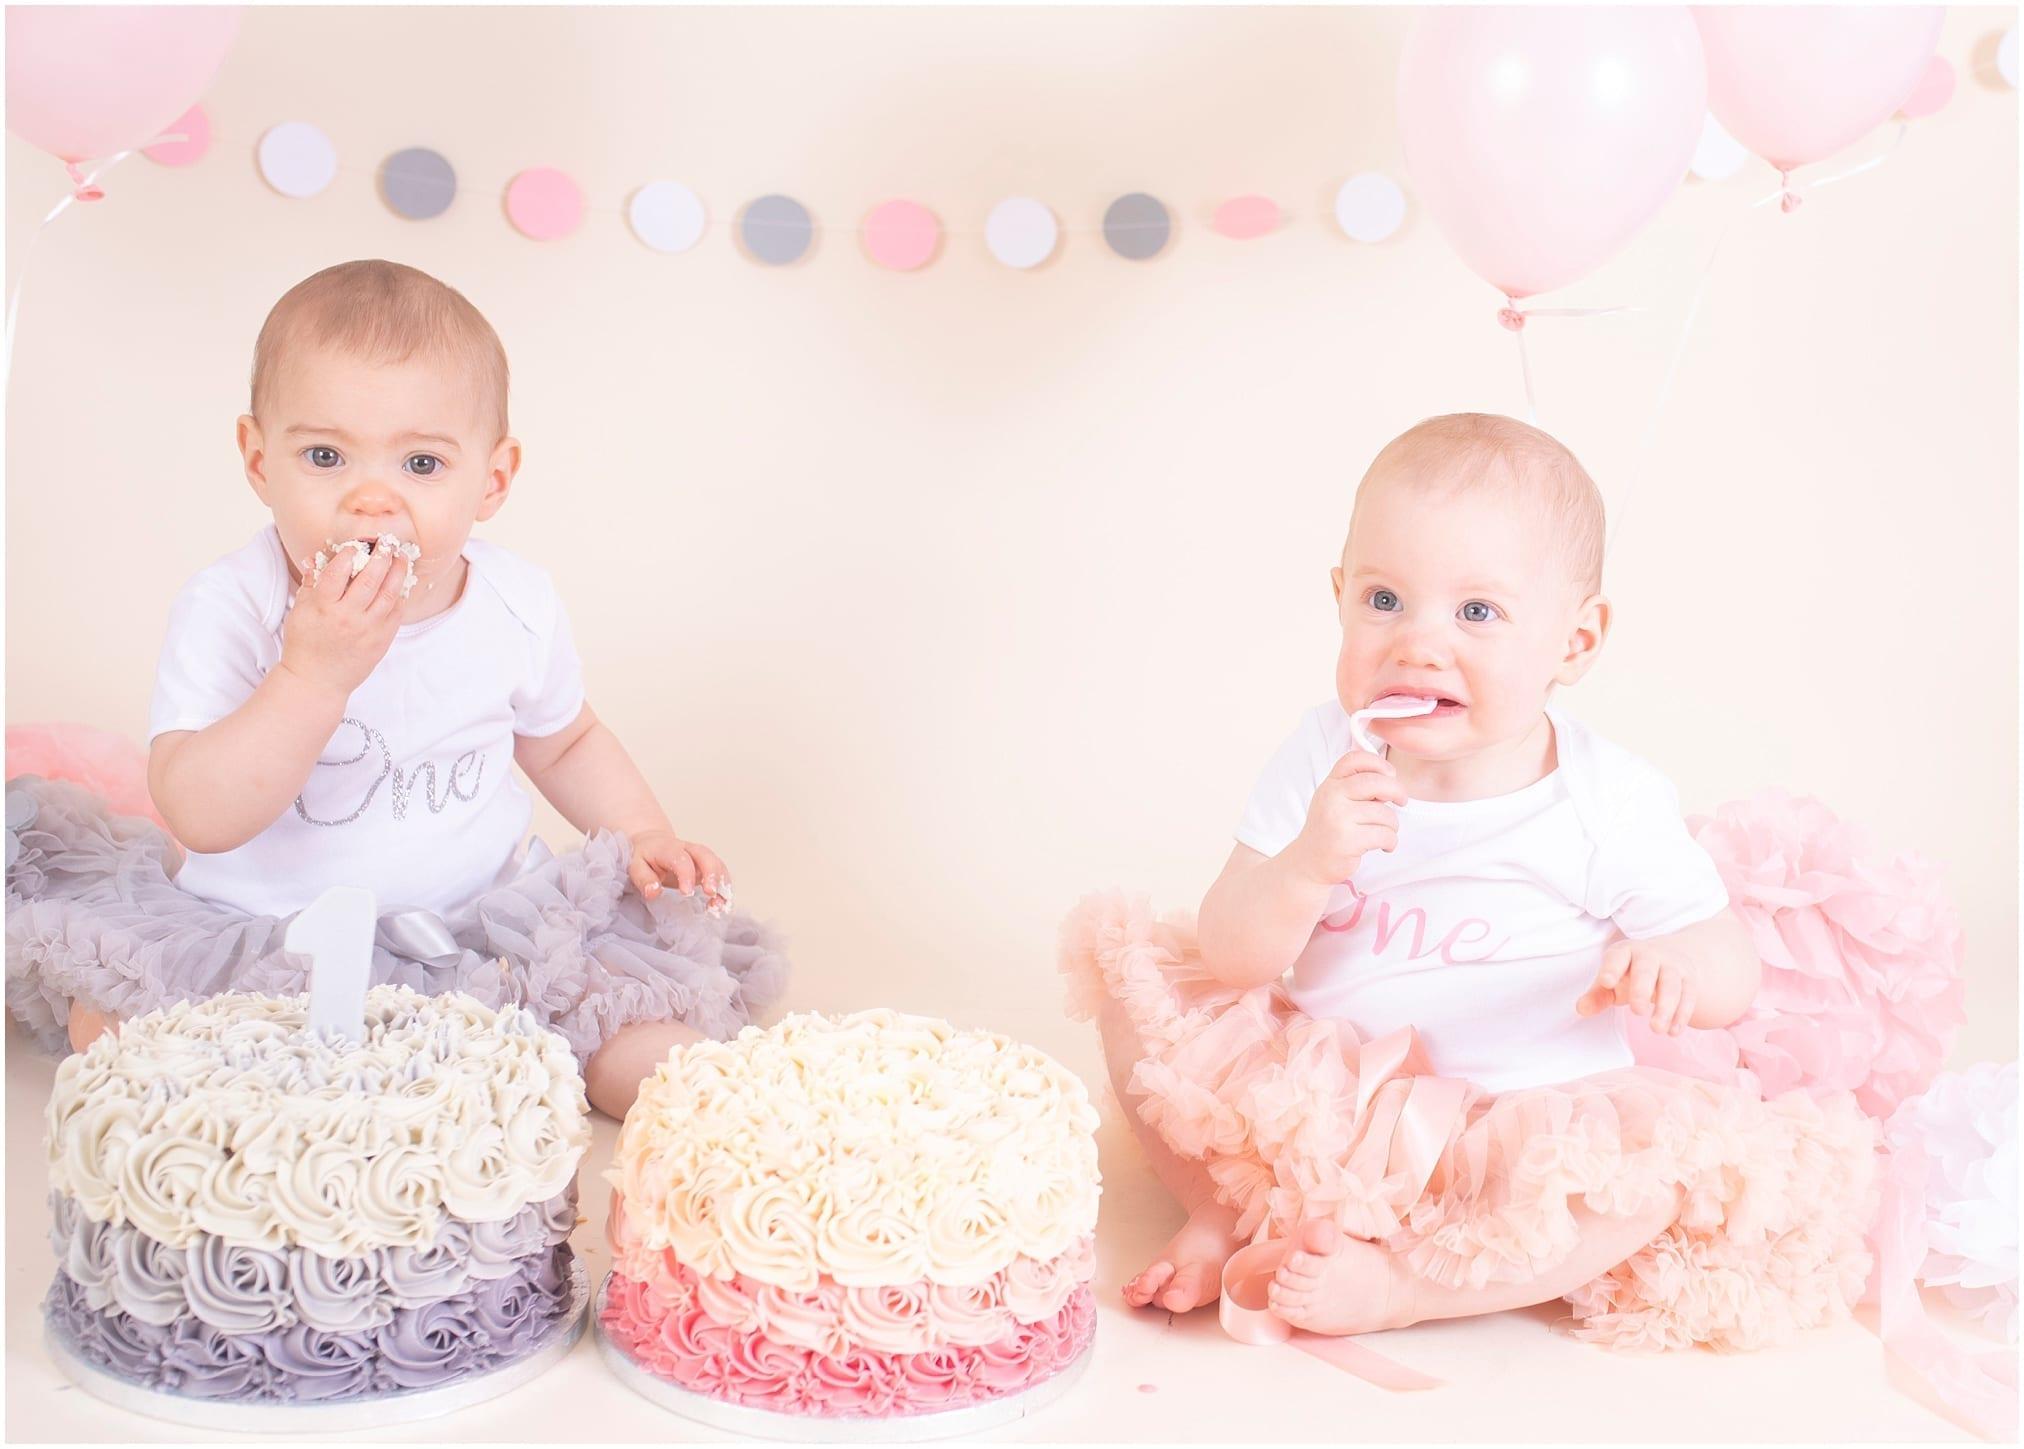 Twin Girls Cake Smash – Cake Smash Photography Fife